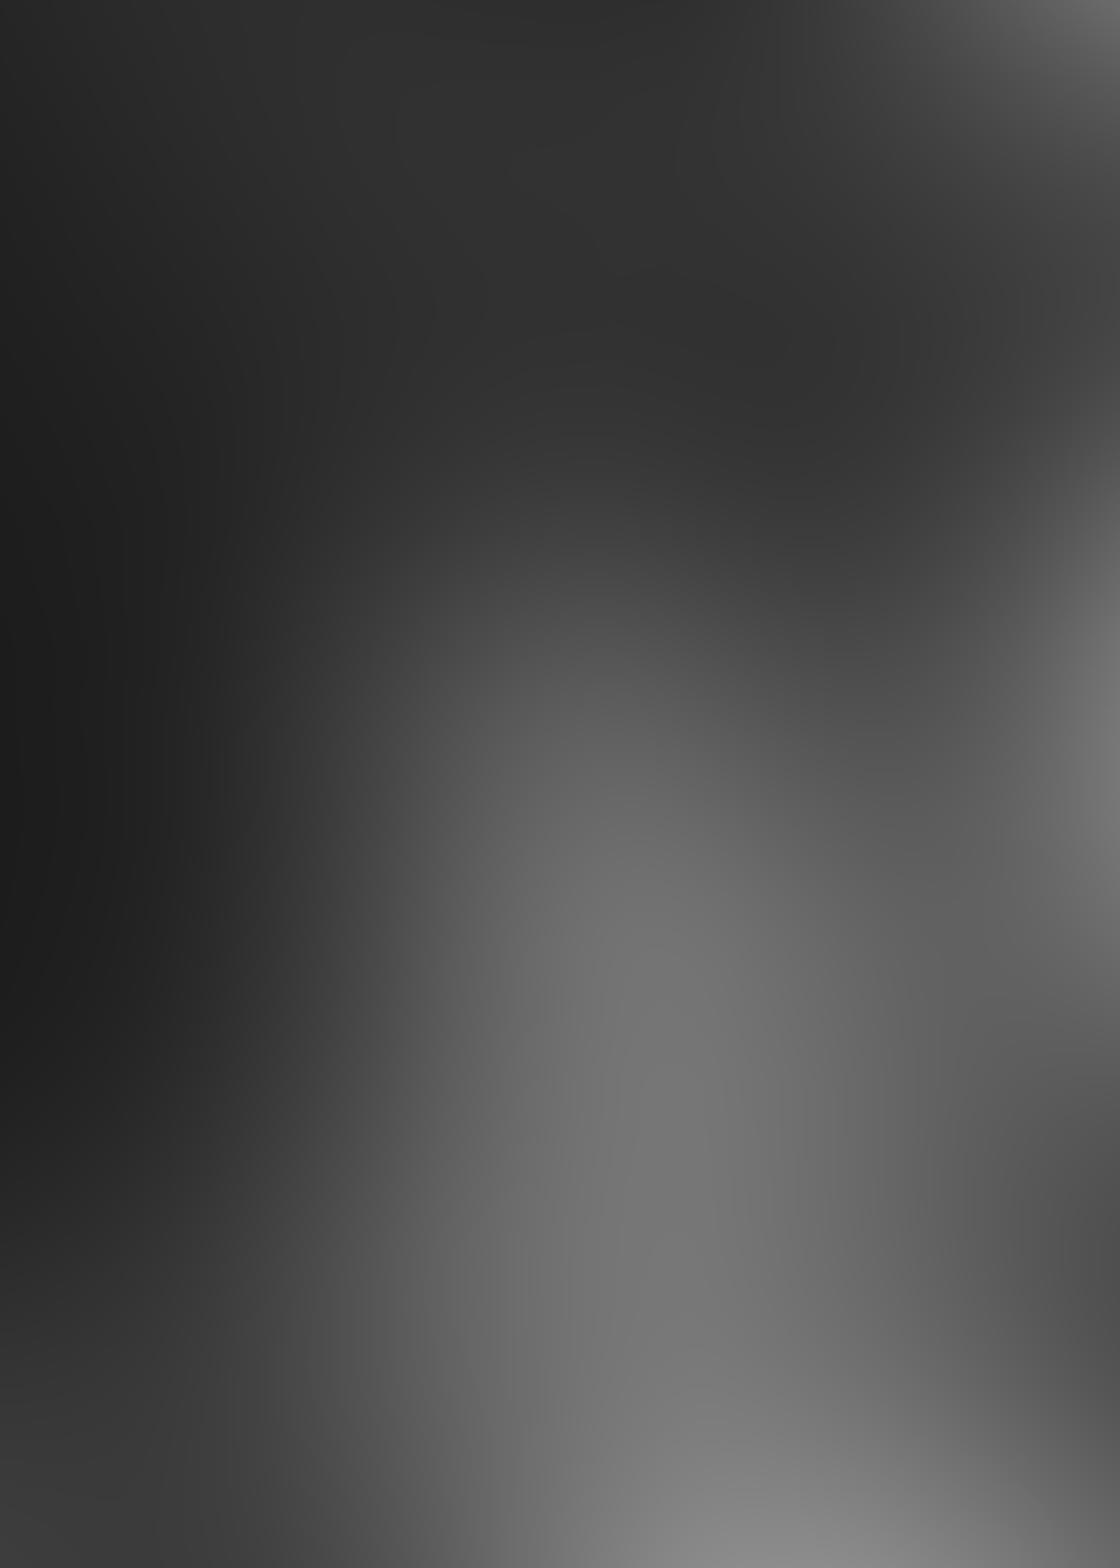 Black & White iPhone Portrait Photos 9